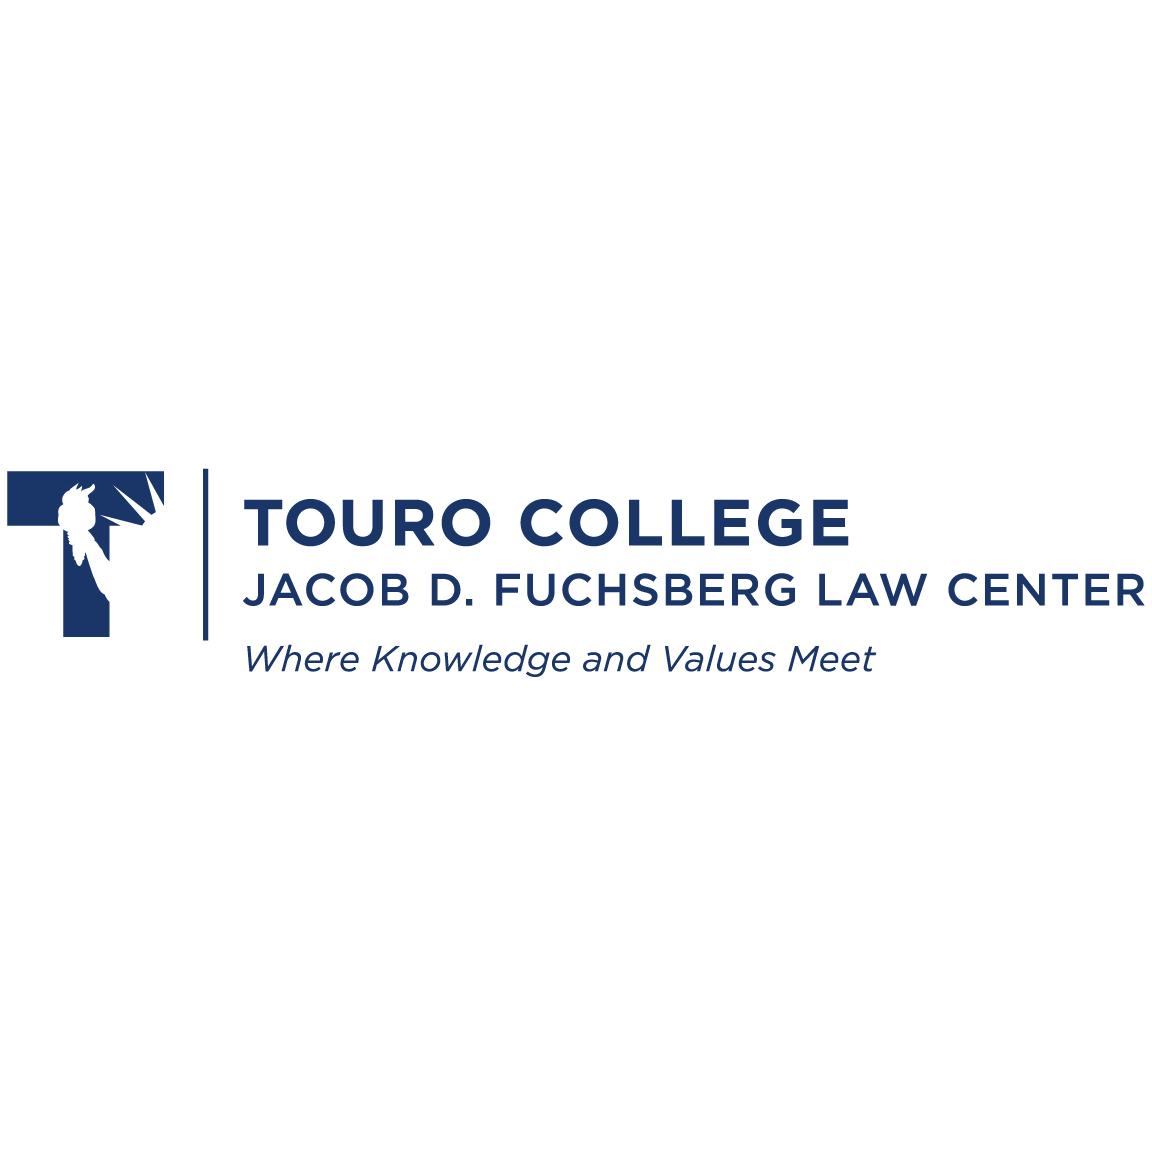 Touro College Jacob D. Fuchsberg Law Center